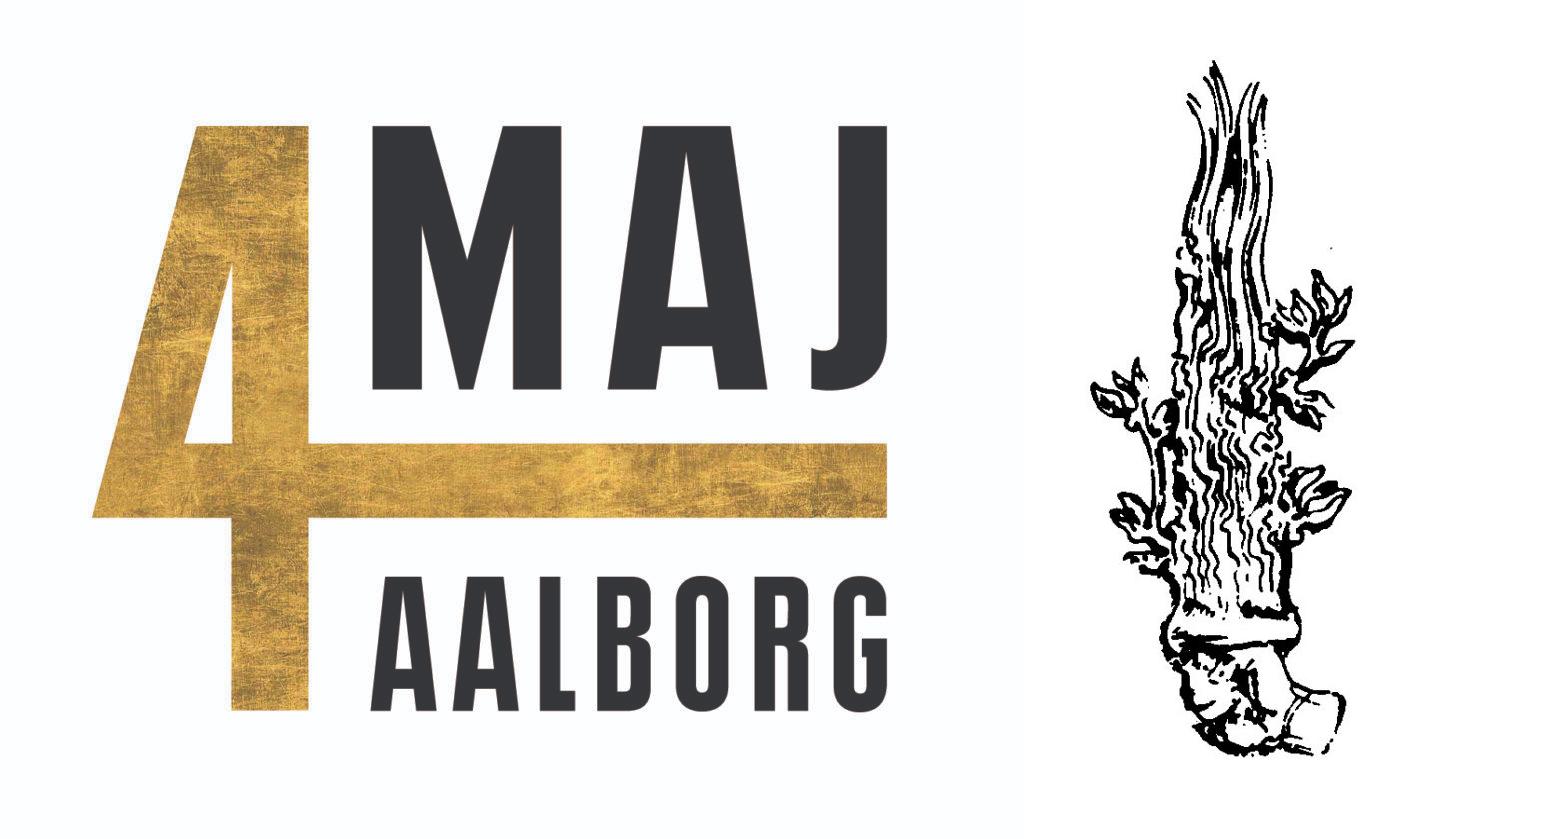 4. Maj Kollegiet Aalborg